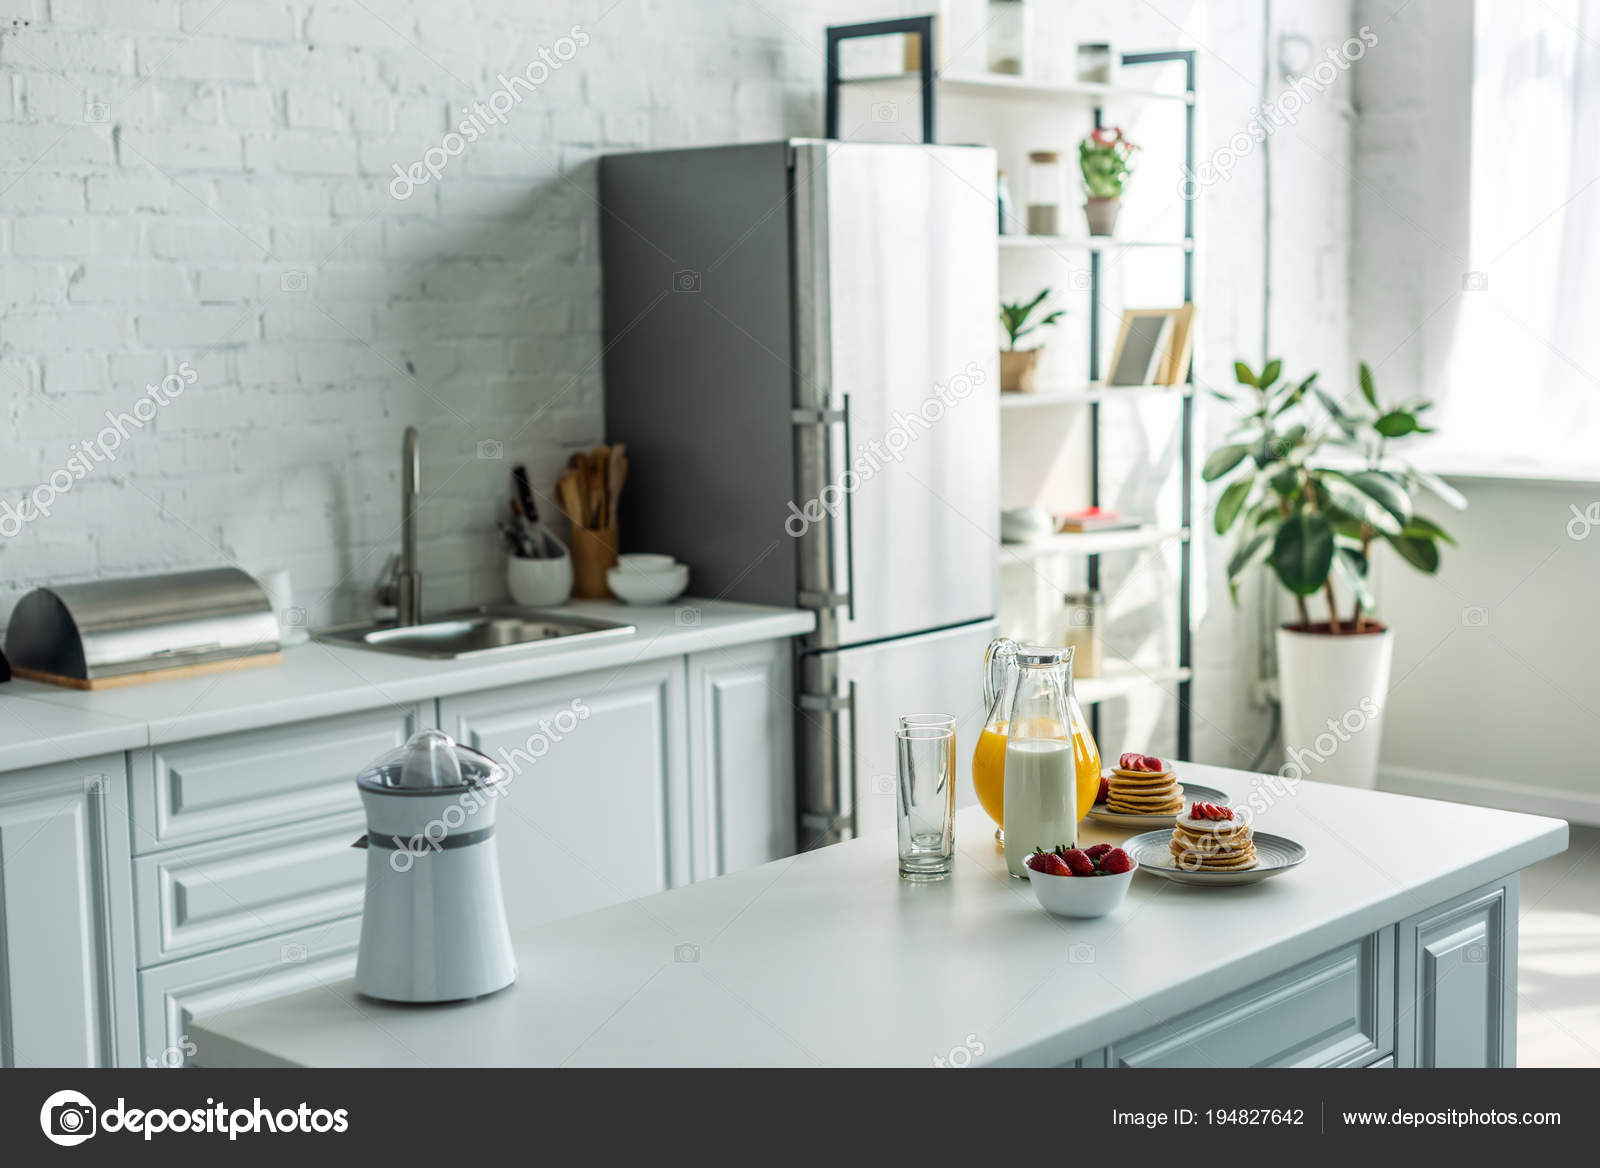 kitchen counter farmhouse industrial 现代轻厨房的内部与冰箱和厨房柜台 图库照片 c vitalikradko 194827642